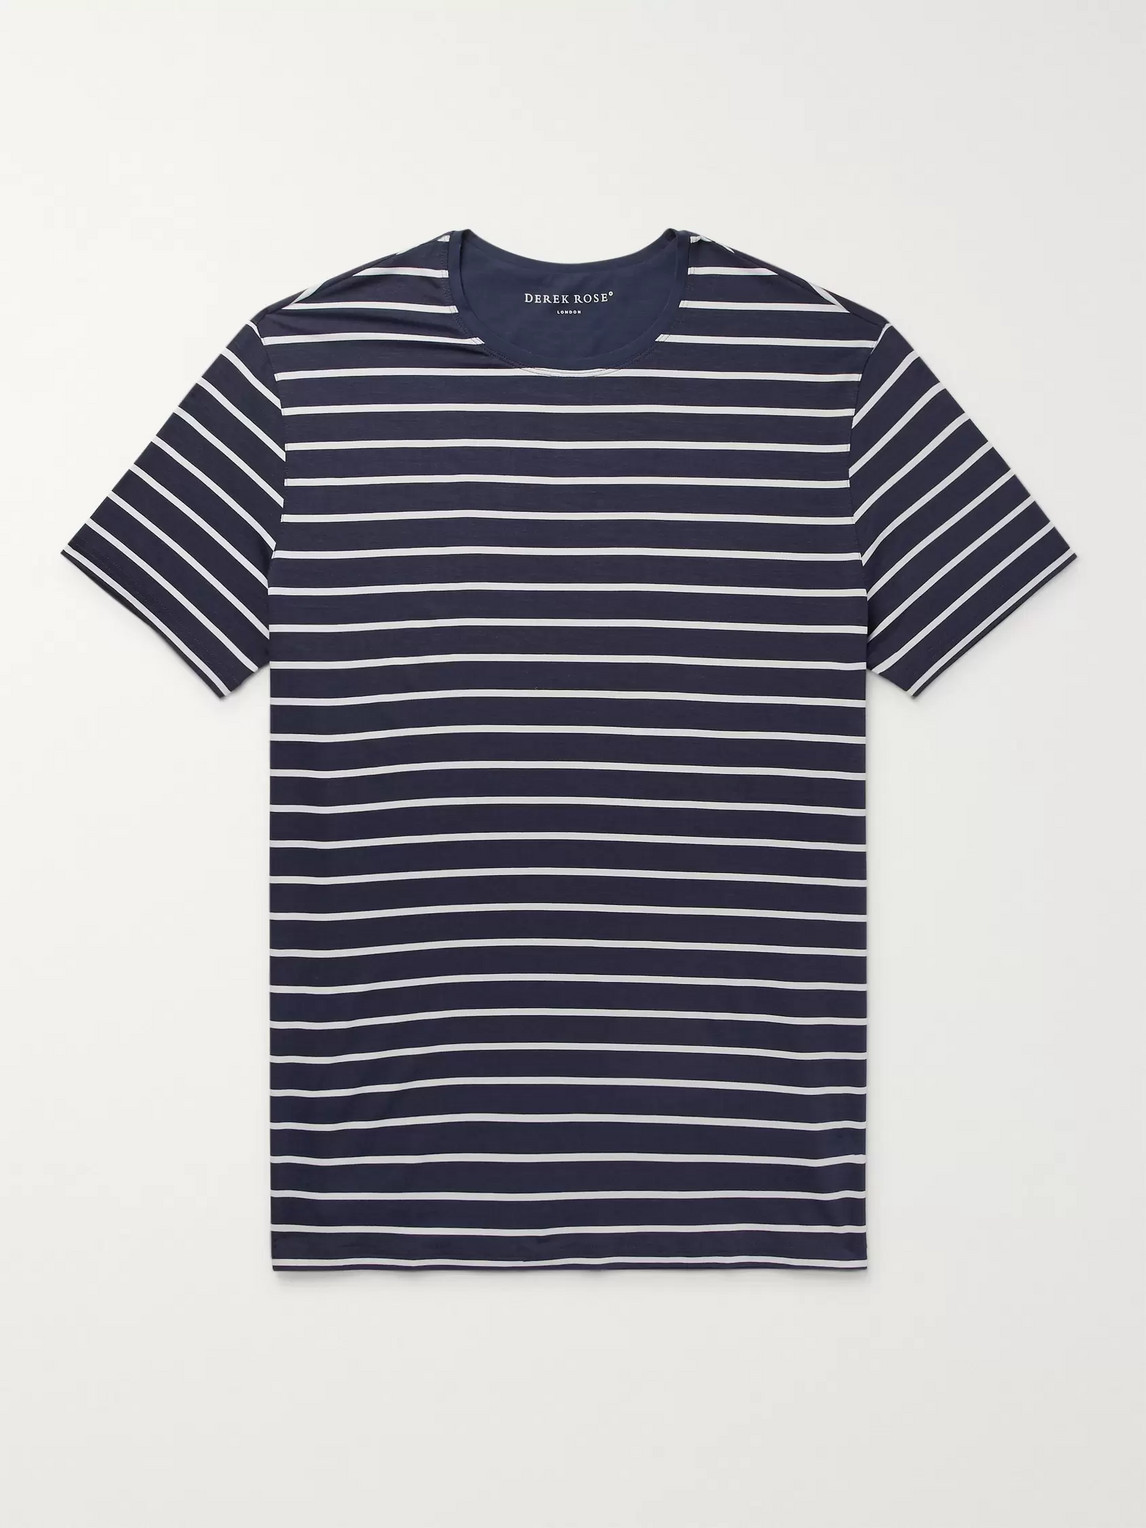 derek rose - alfie striped stretch-micro modal jersey t-shirt - blue - m - men